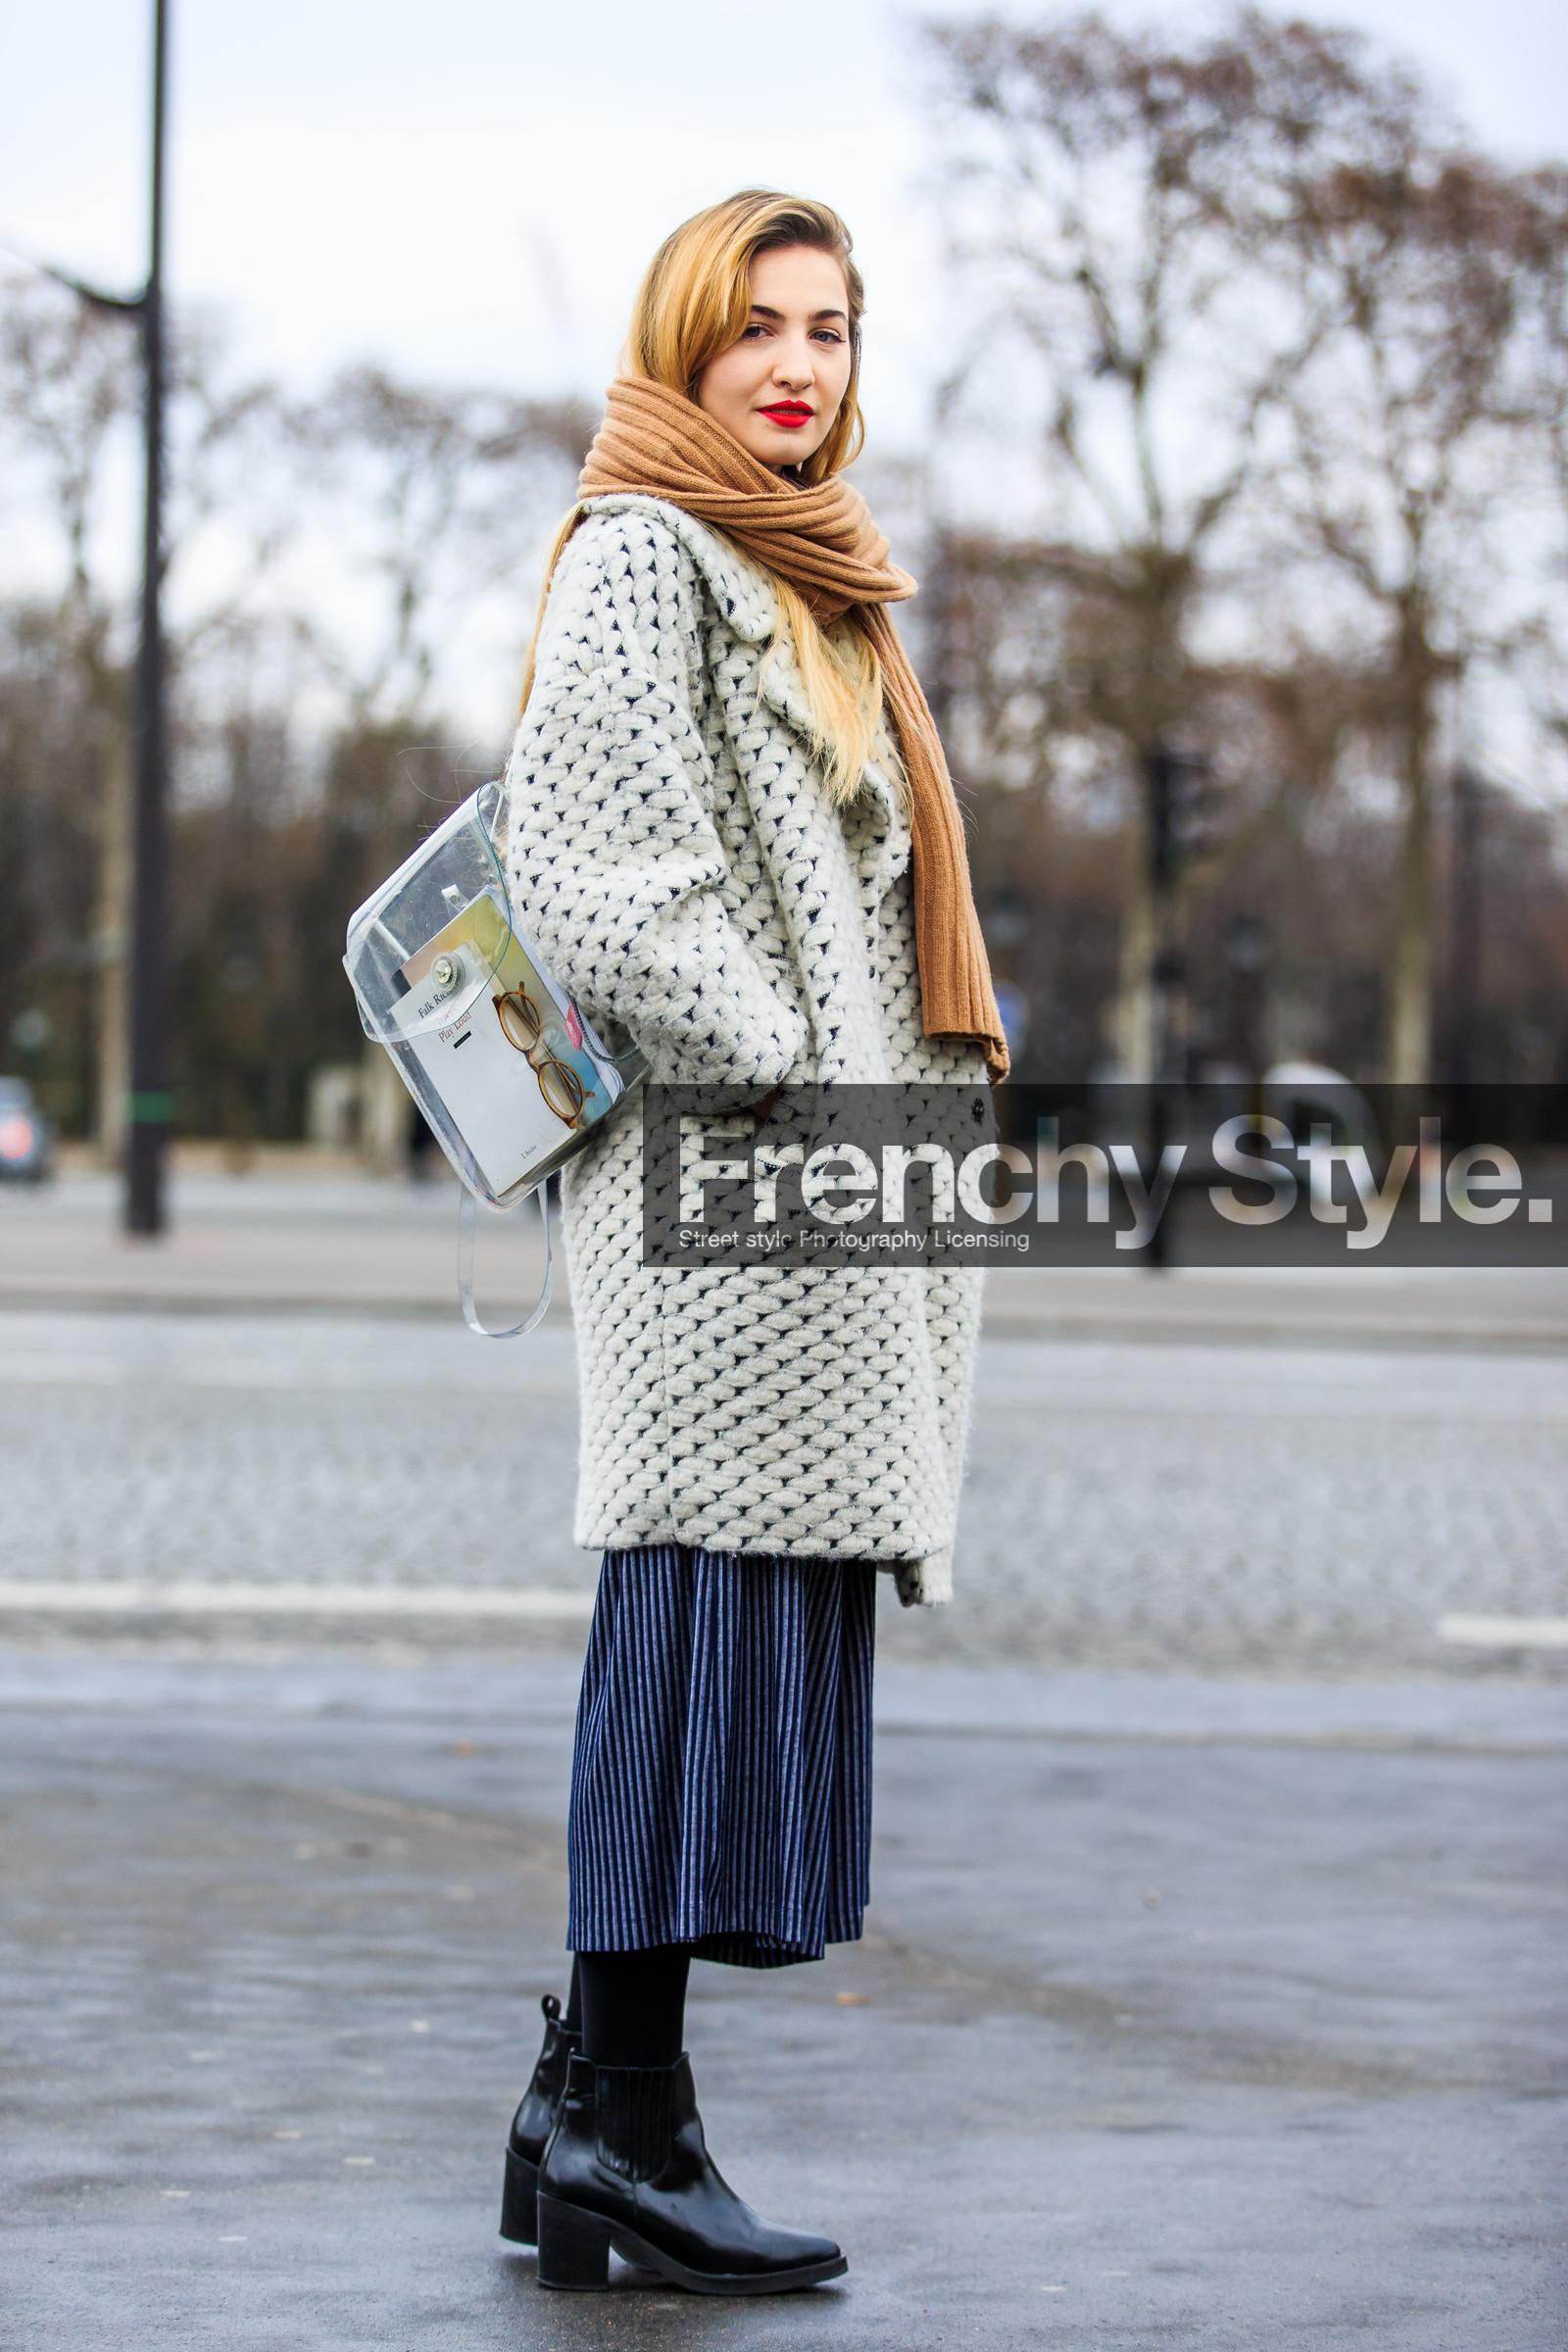 1601P0243.jpg   Frenchy Style